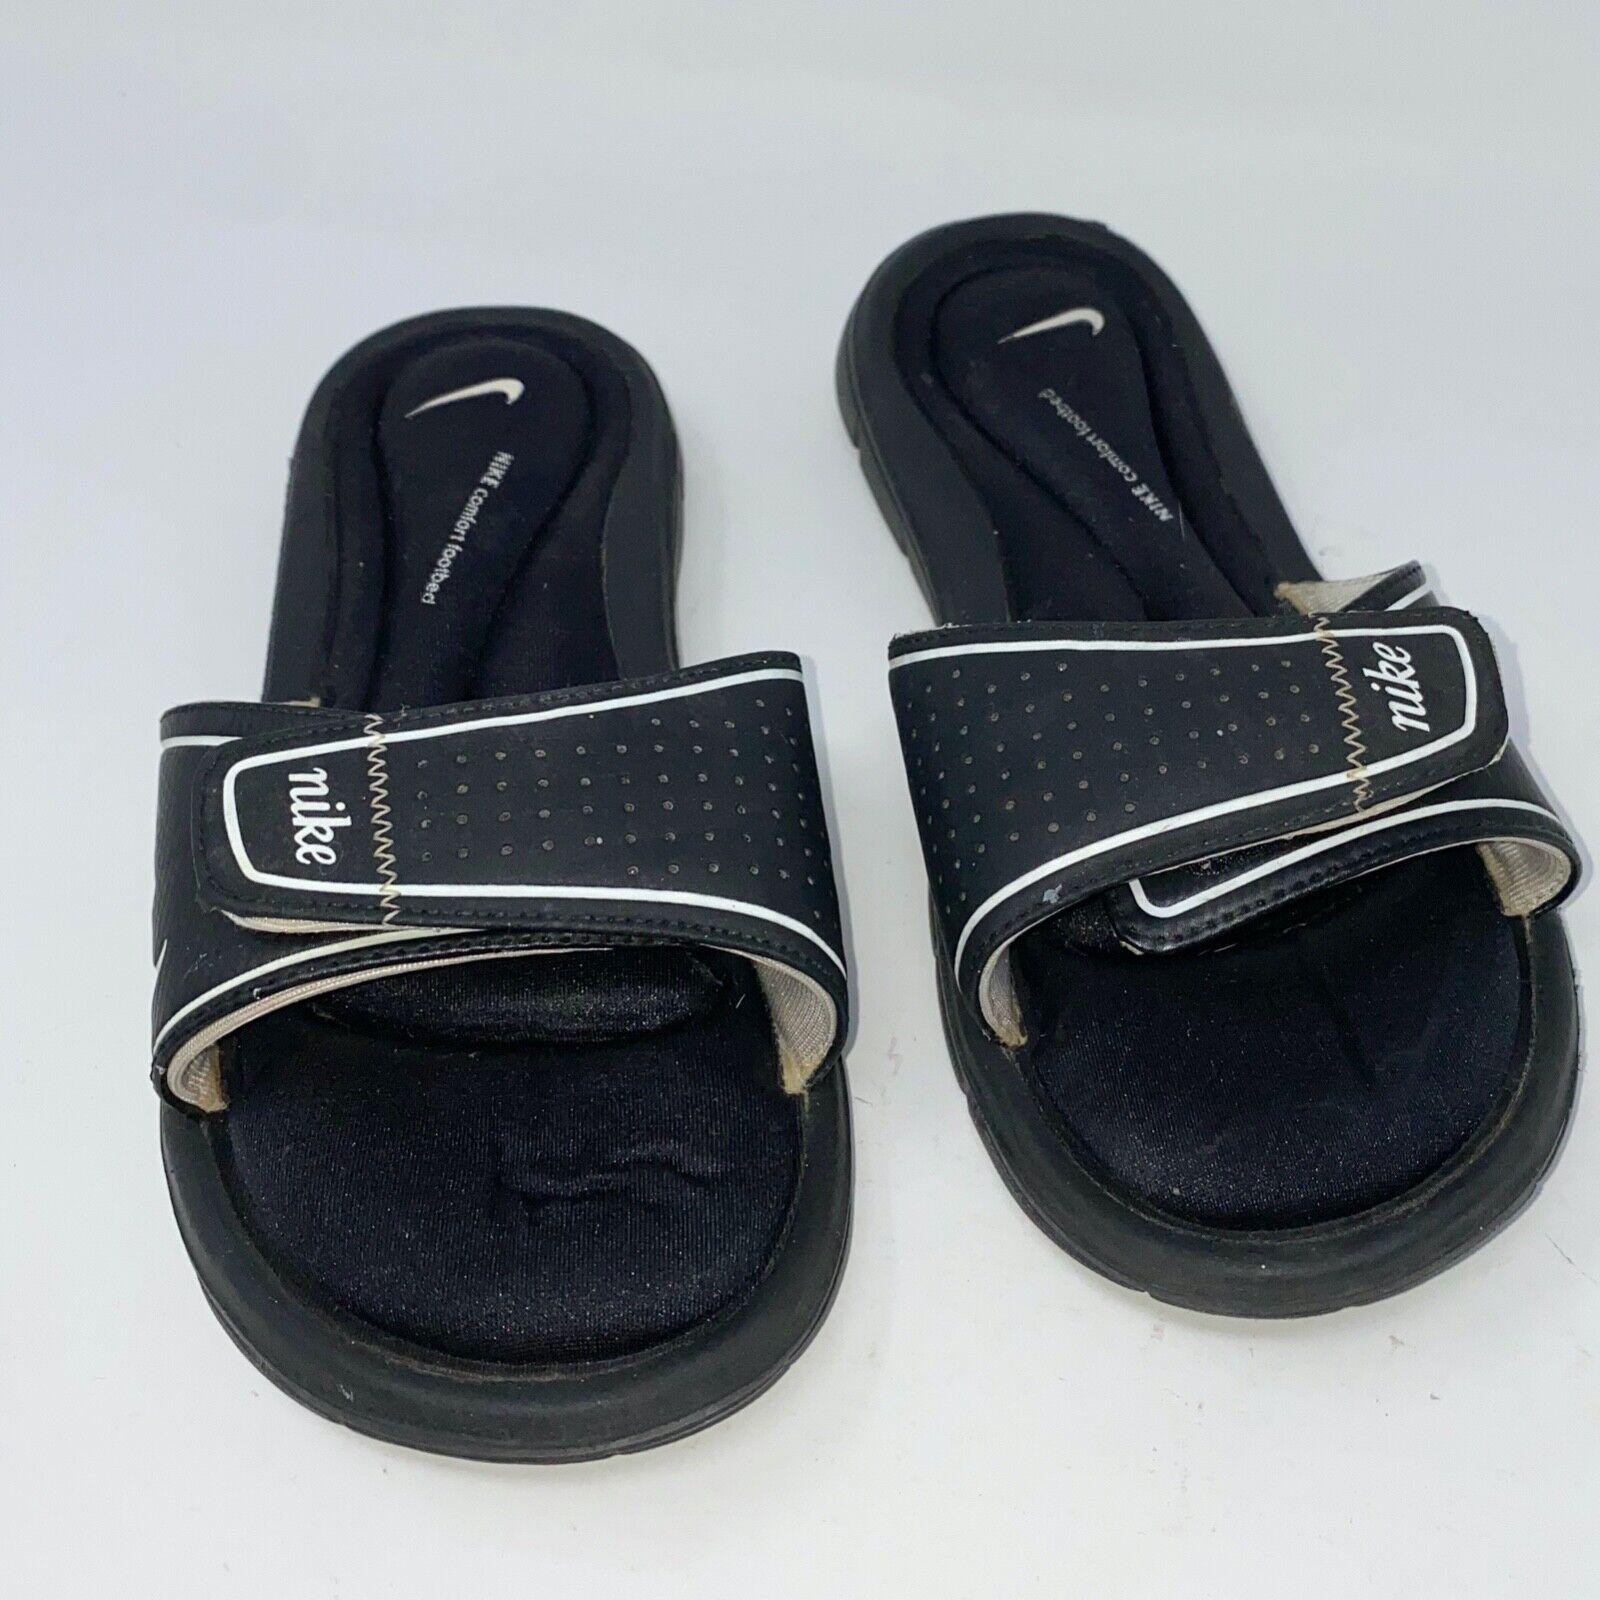 Slides Comfort Memory Foam Sandals